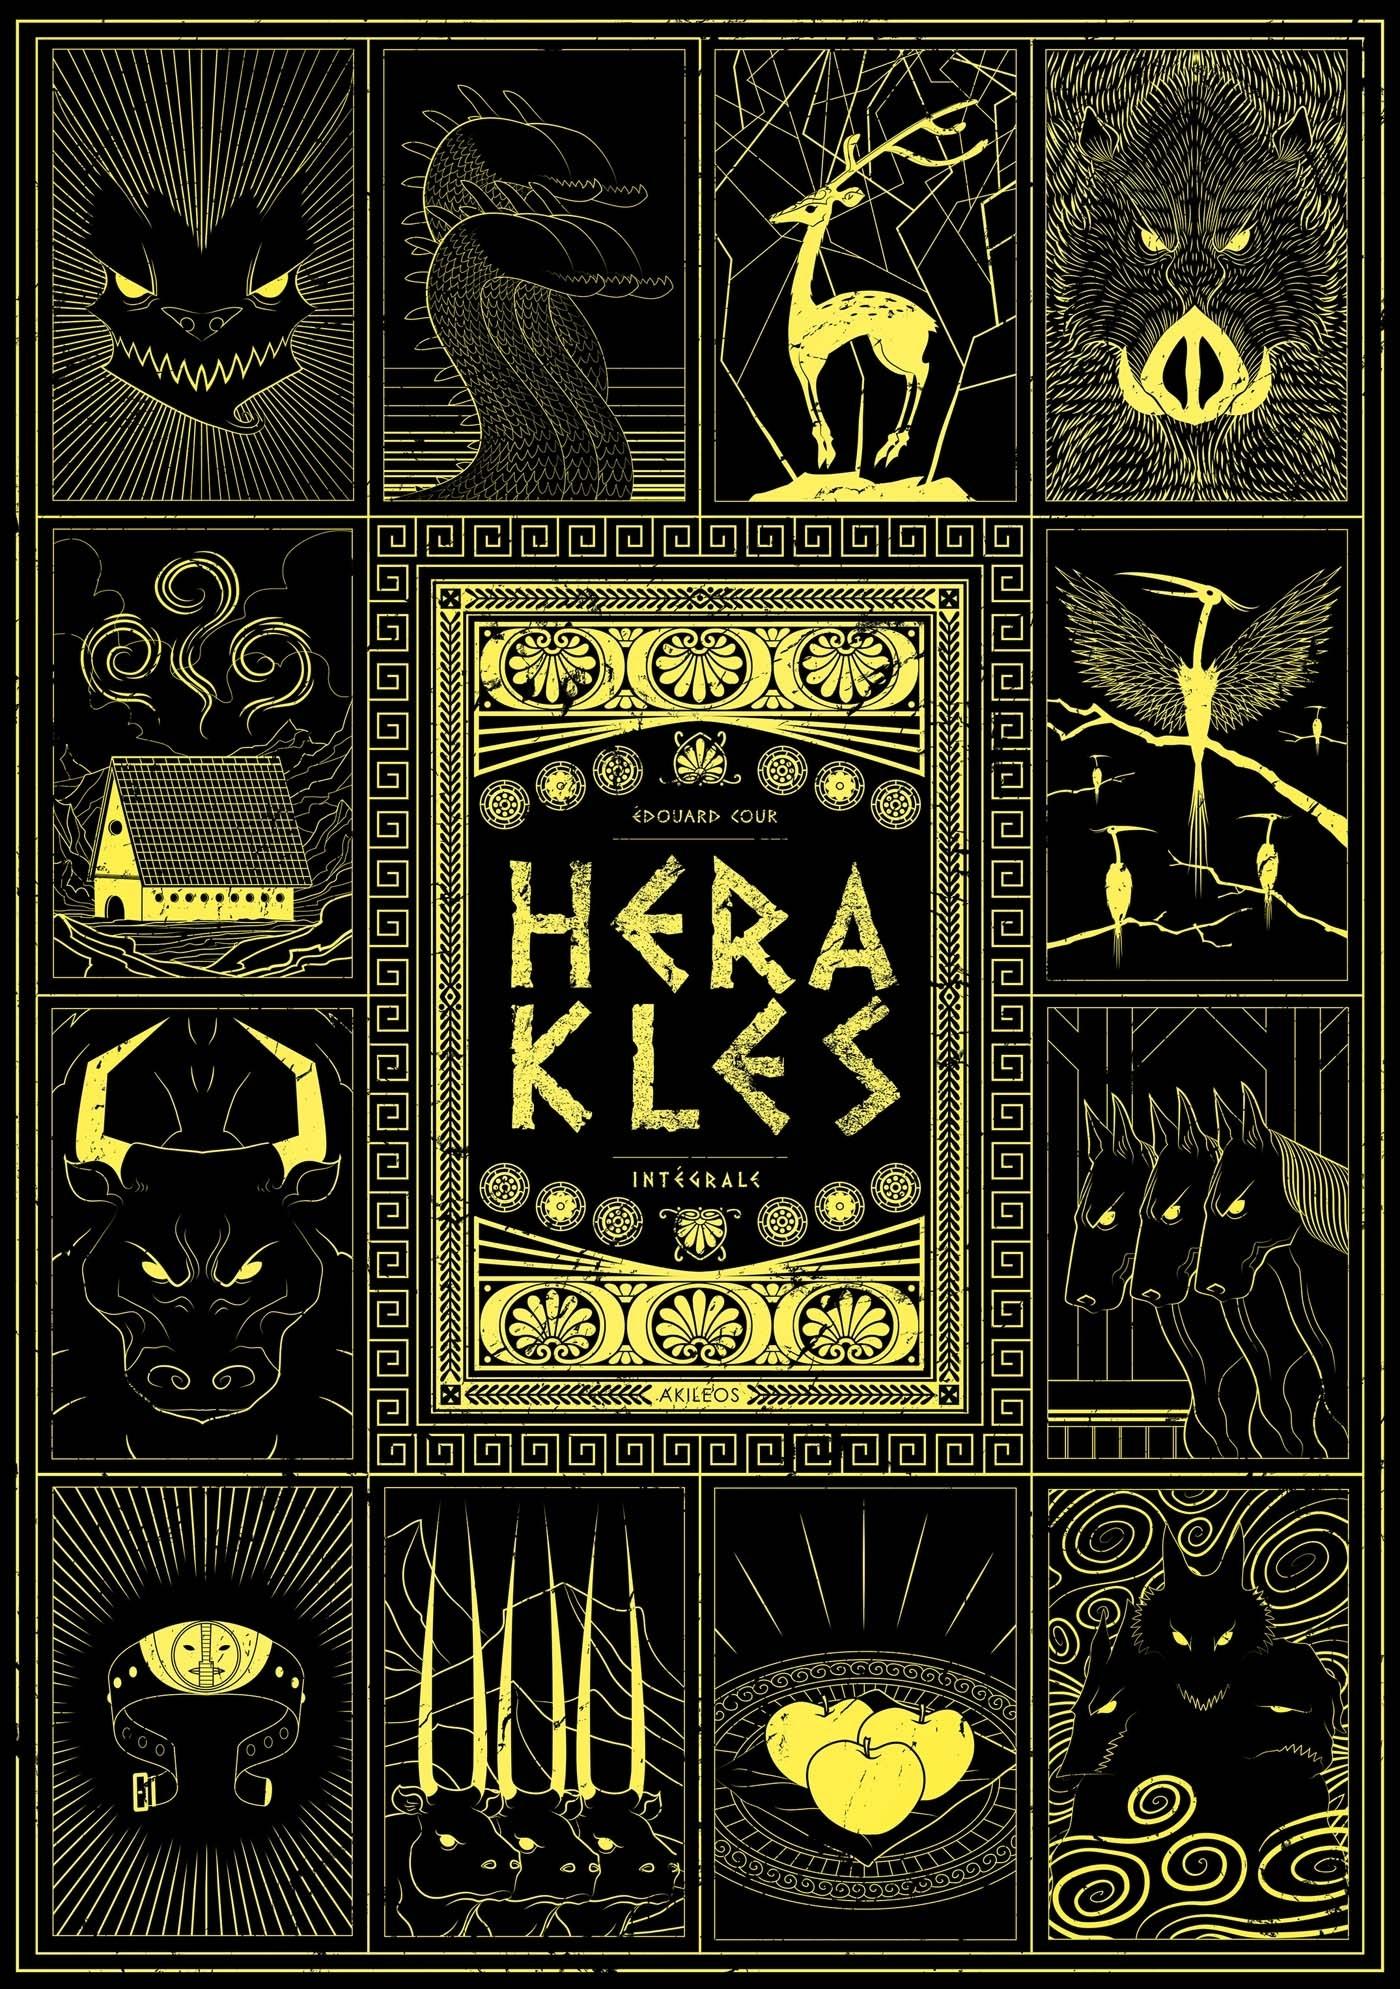 HERAKLES - INTEGRALE